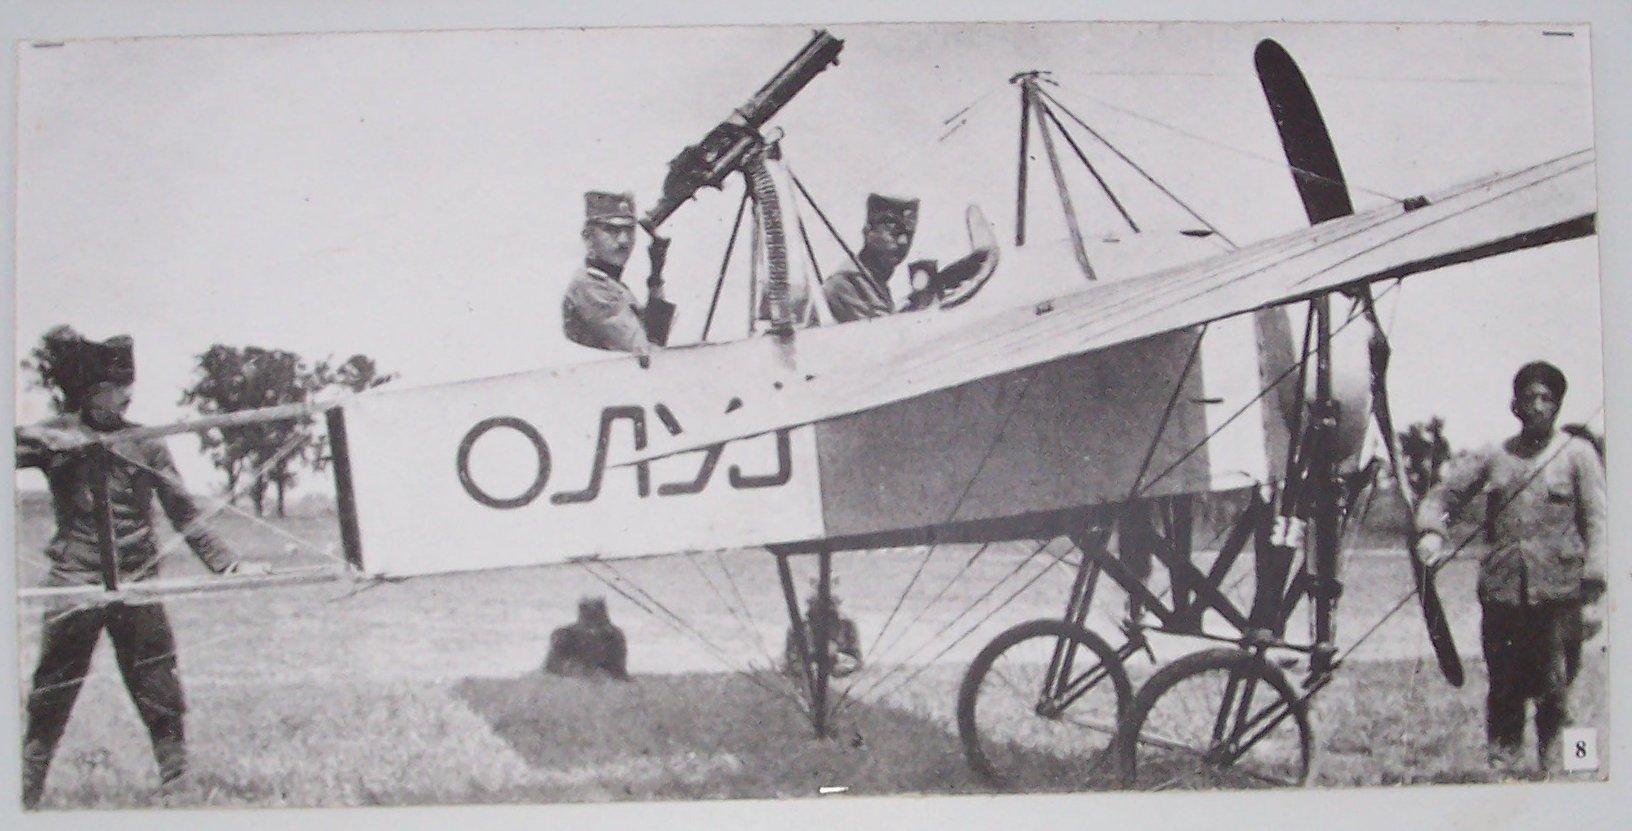 First Serbian Armed Plane 1915 (Wiki)